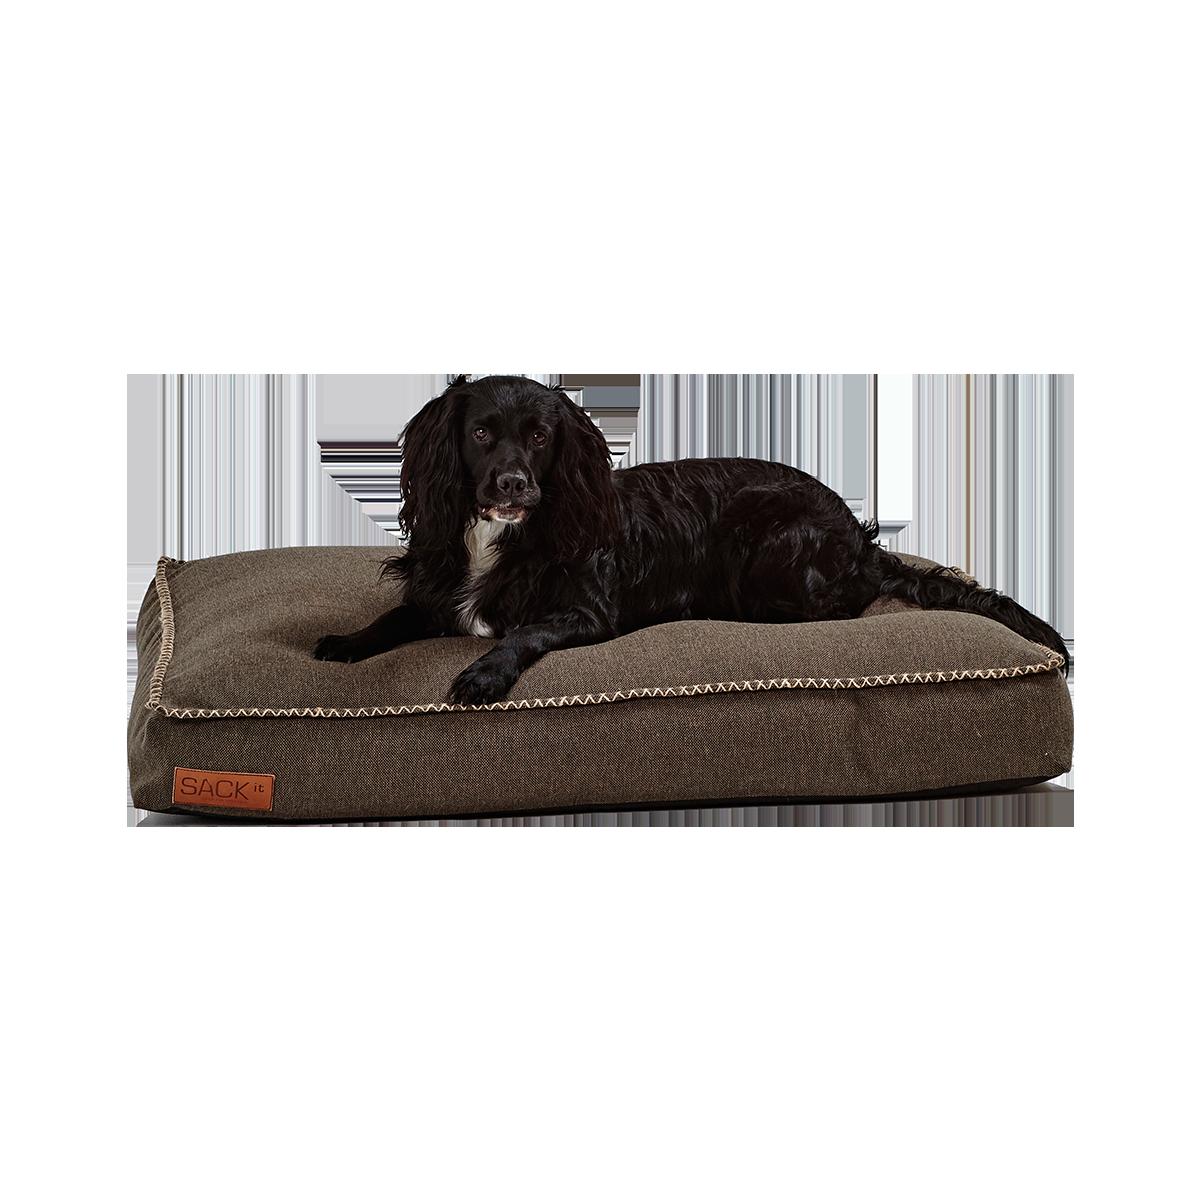 SACKit Dog Bed Large Brown